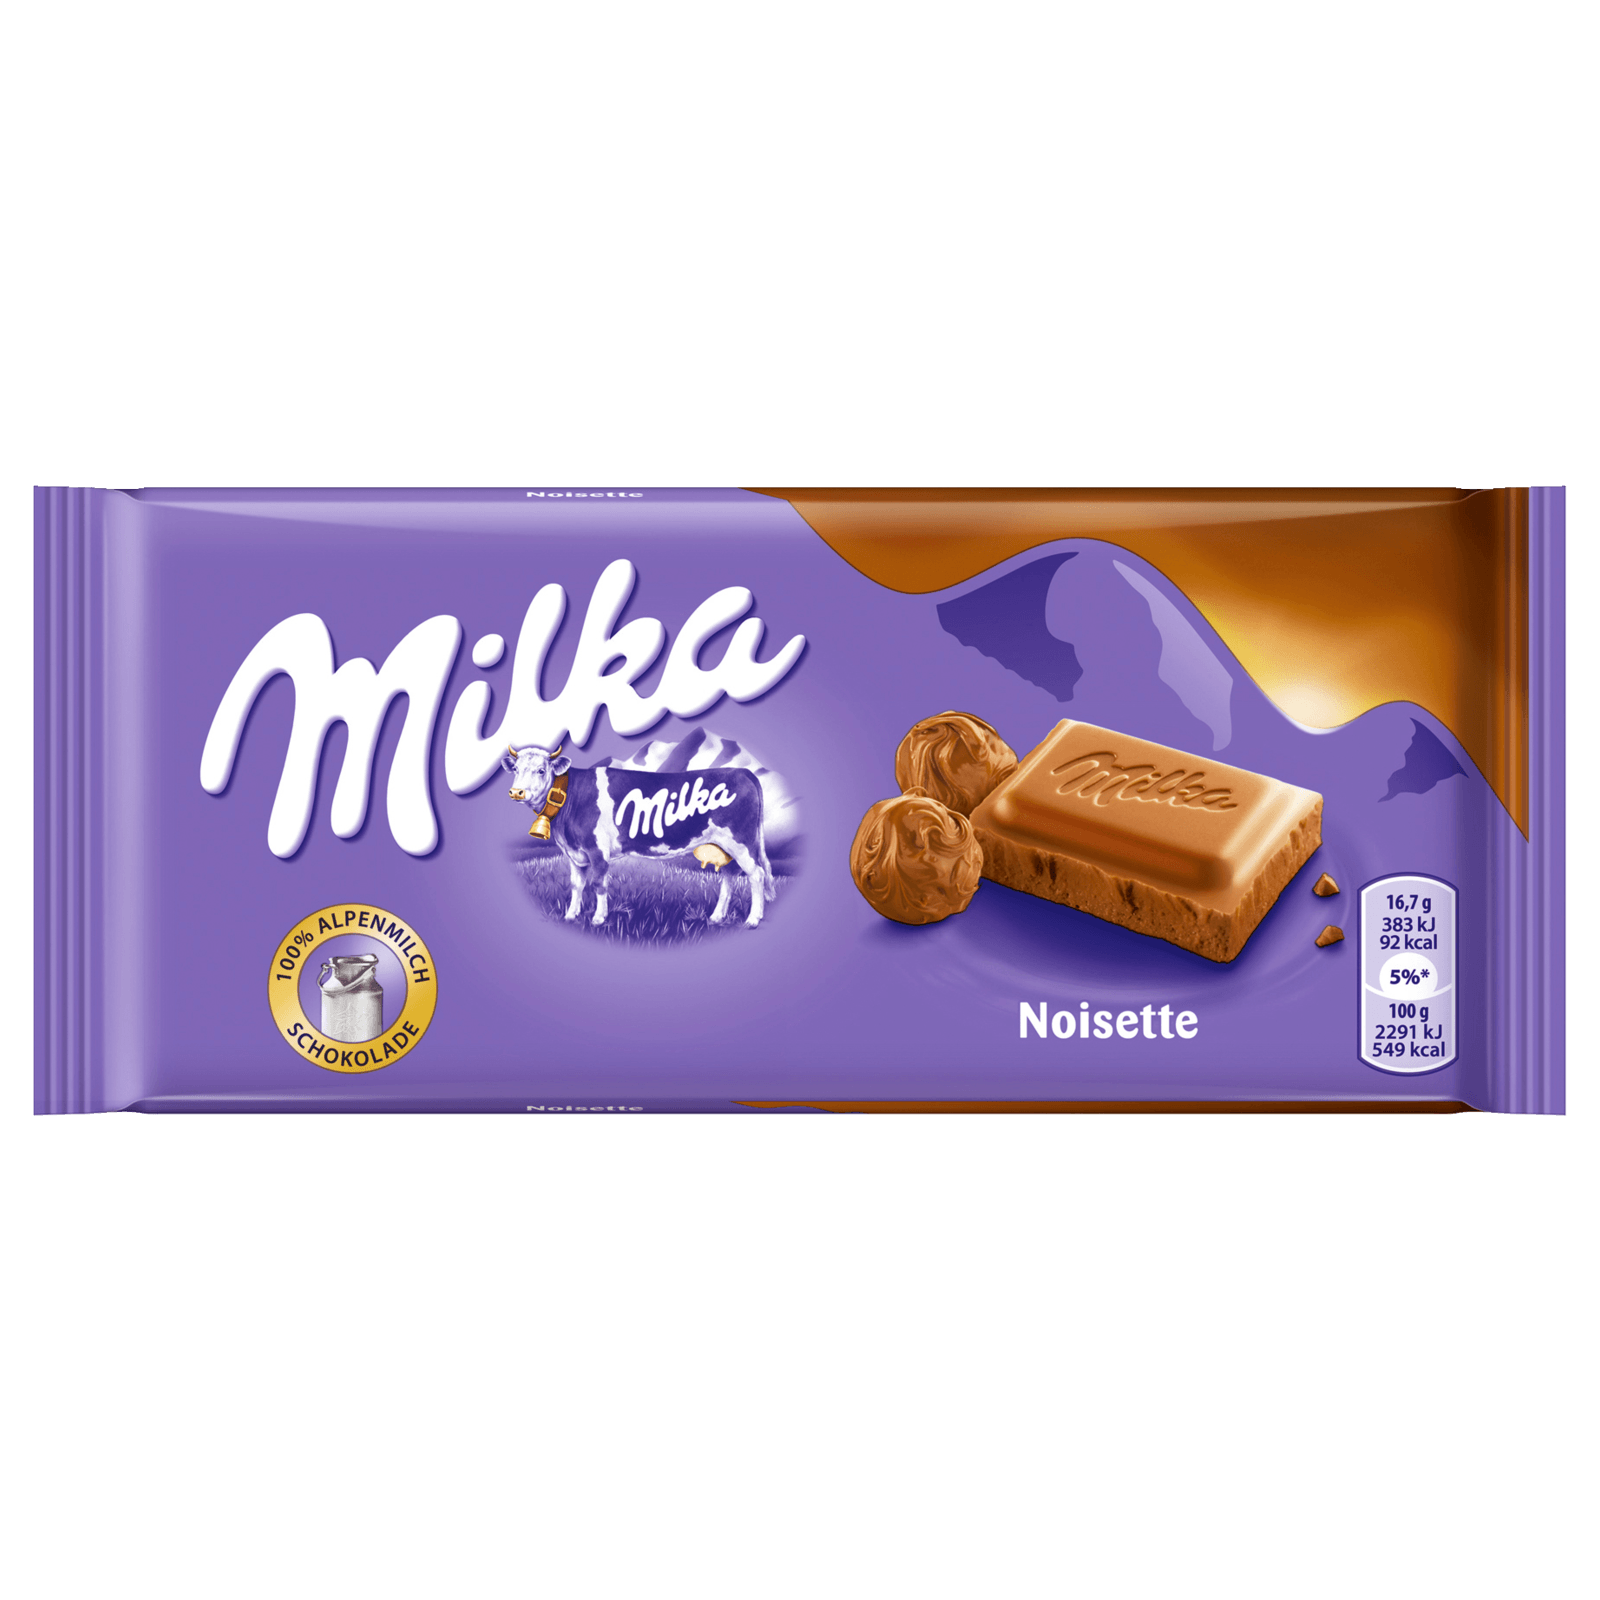 MILKA SCHOKO TAFEL MILCH MIT NOISETTE PASTE